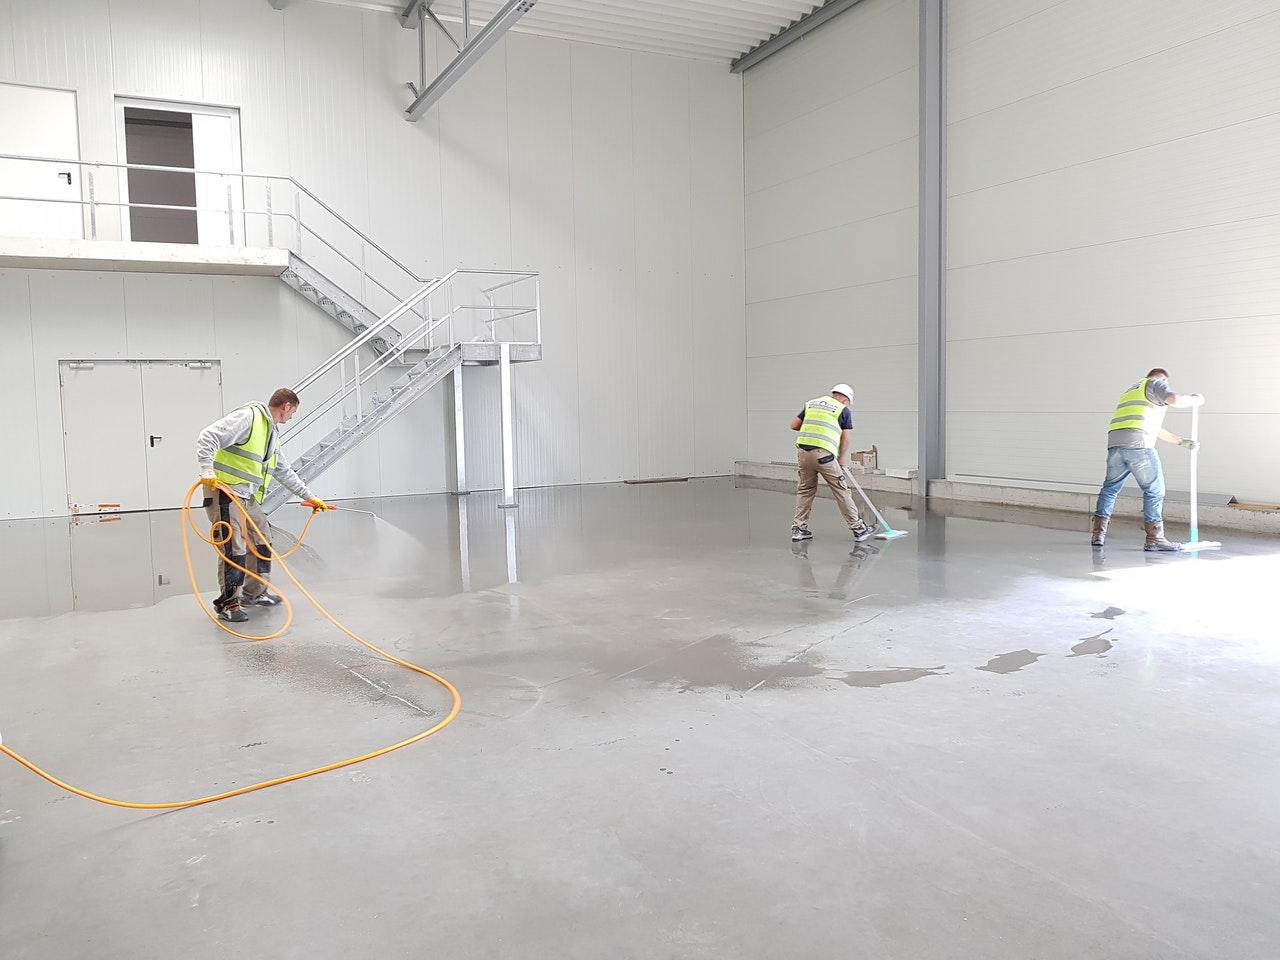 three men cleaning the floor